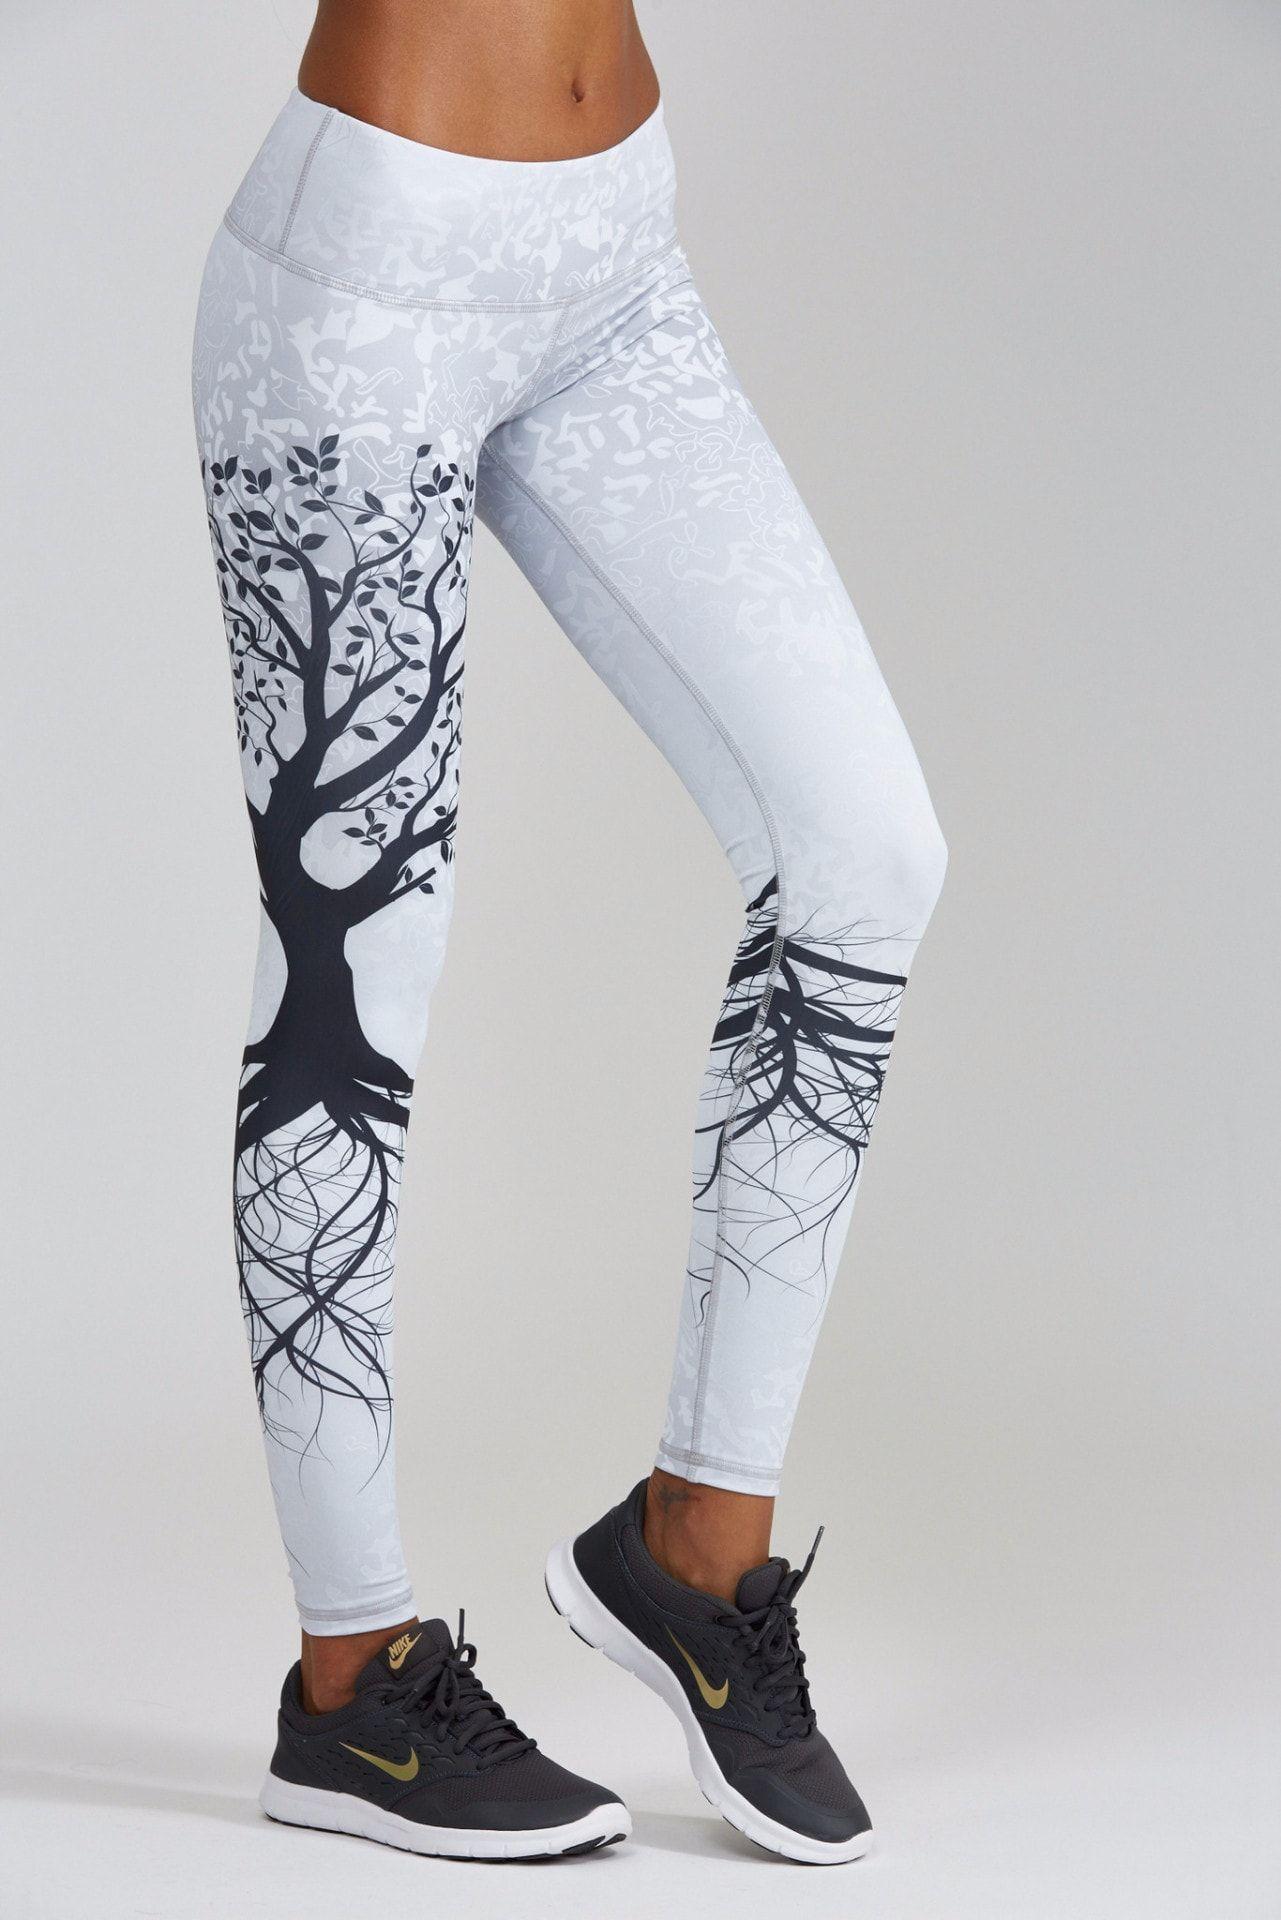 Womens Tree Of Life 3D Print Workout High Waisted Leggings joggers Yoga Pants